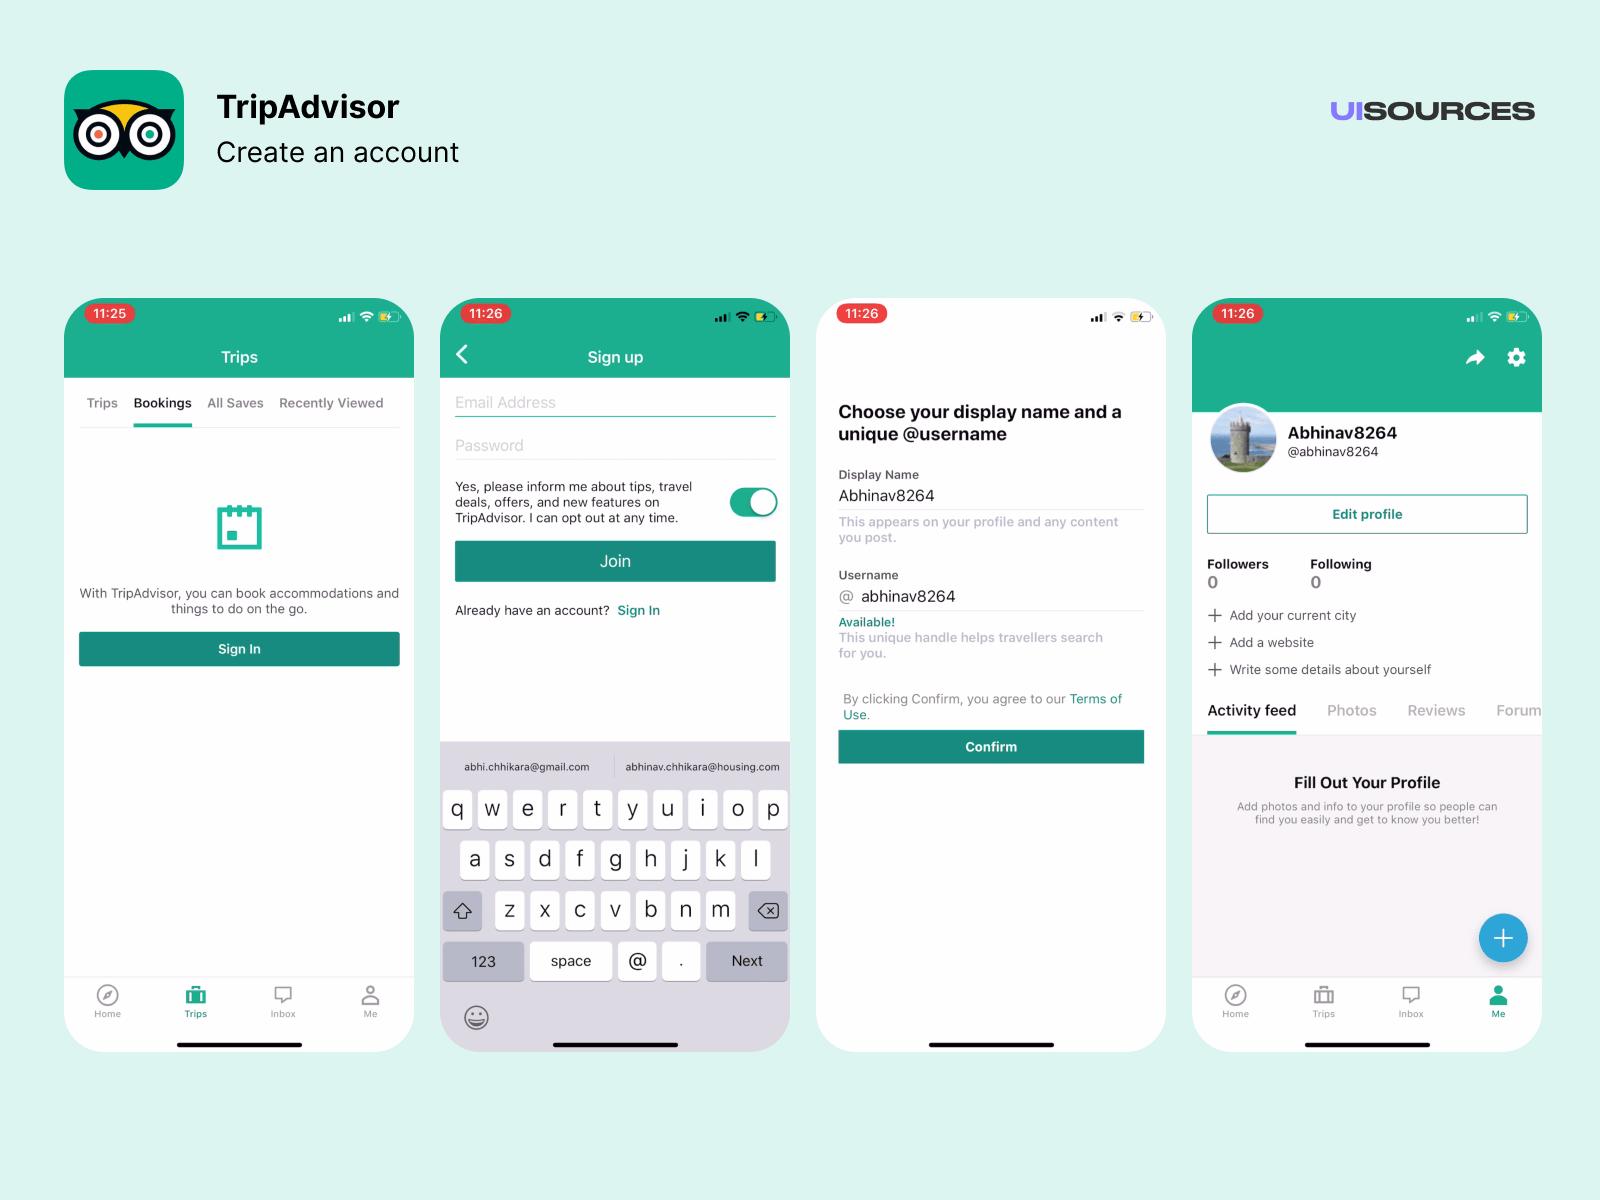 04 tripadvisor create an account